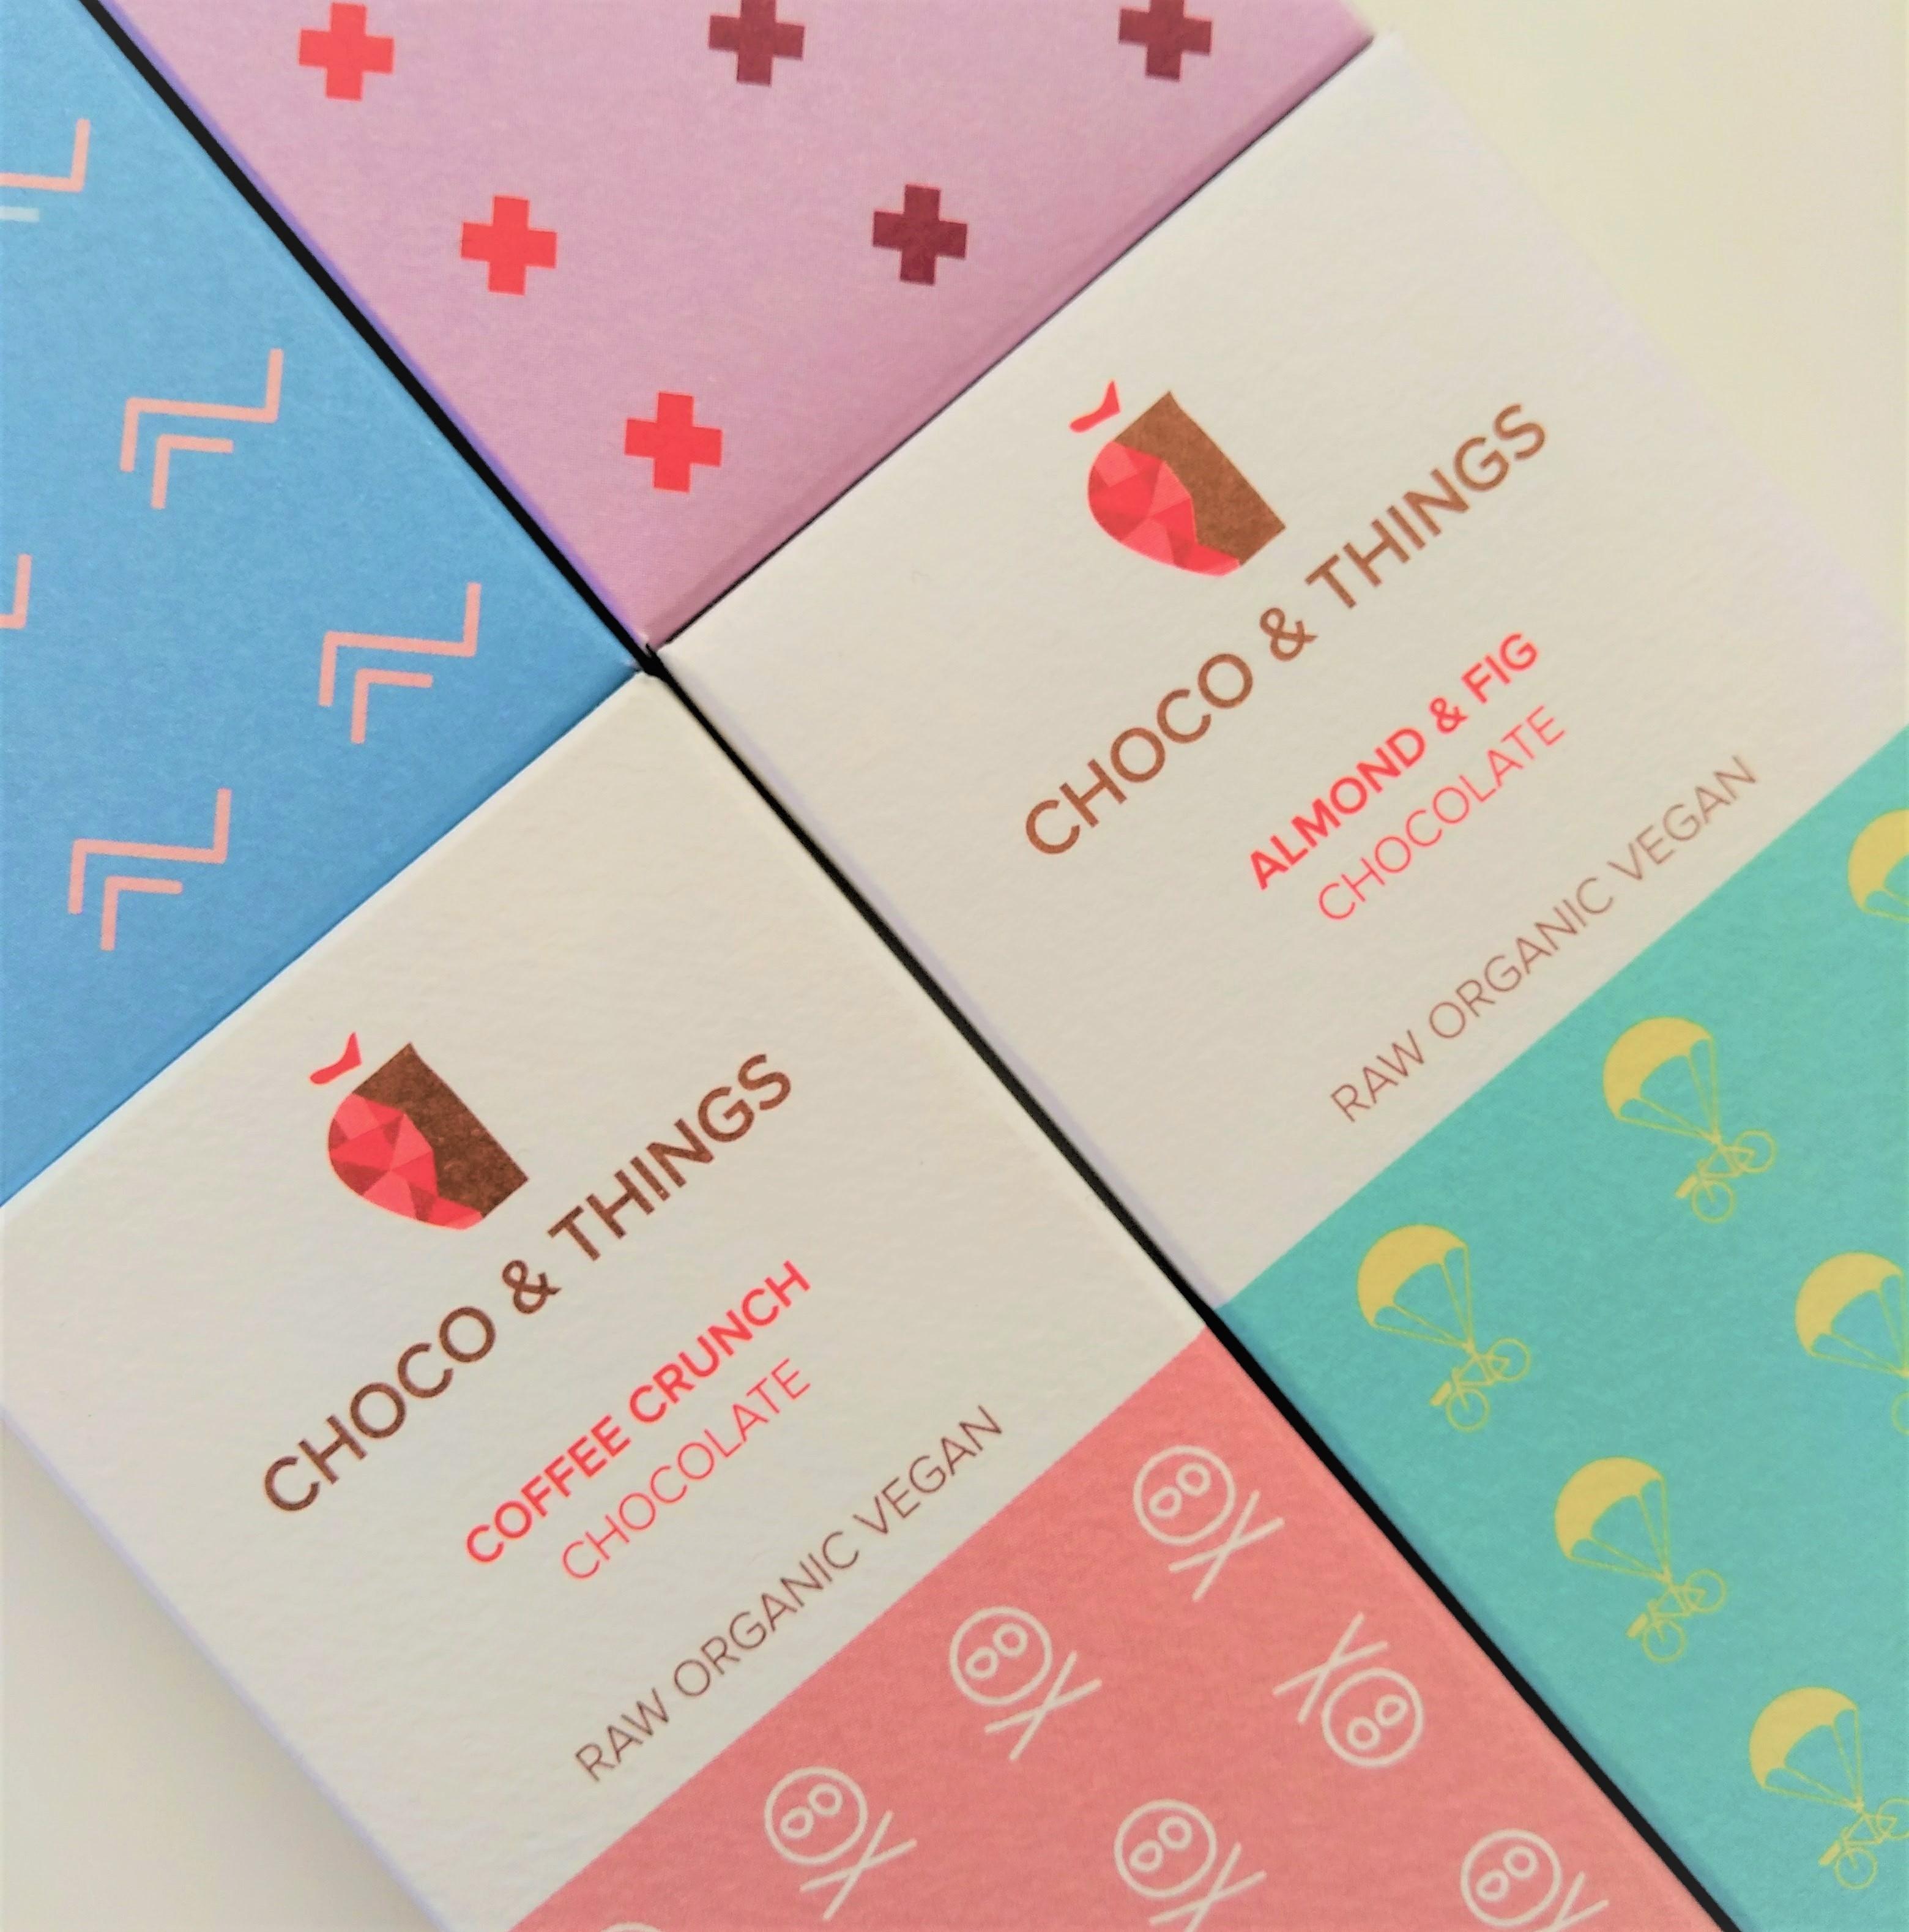 Choco & Things: raw, organic, vegan & Dutch